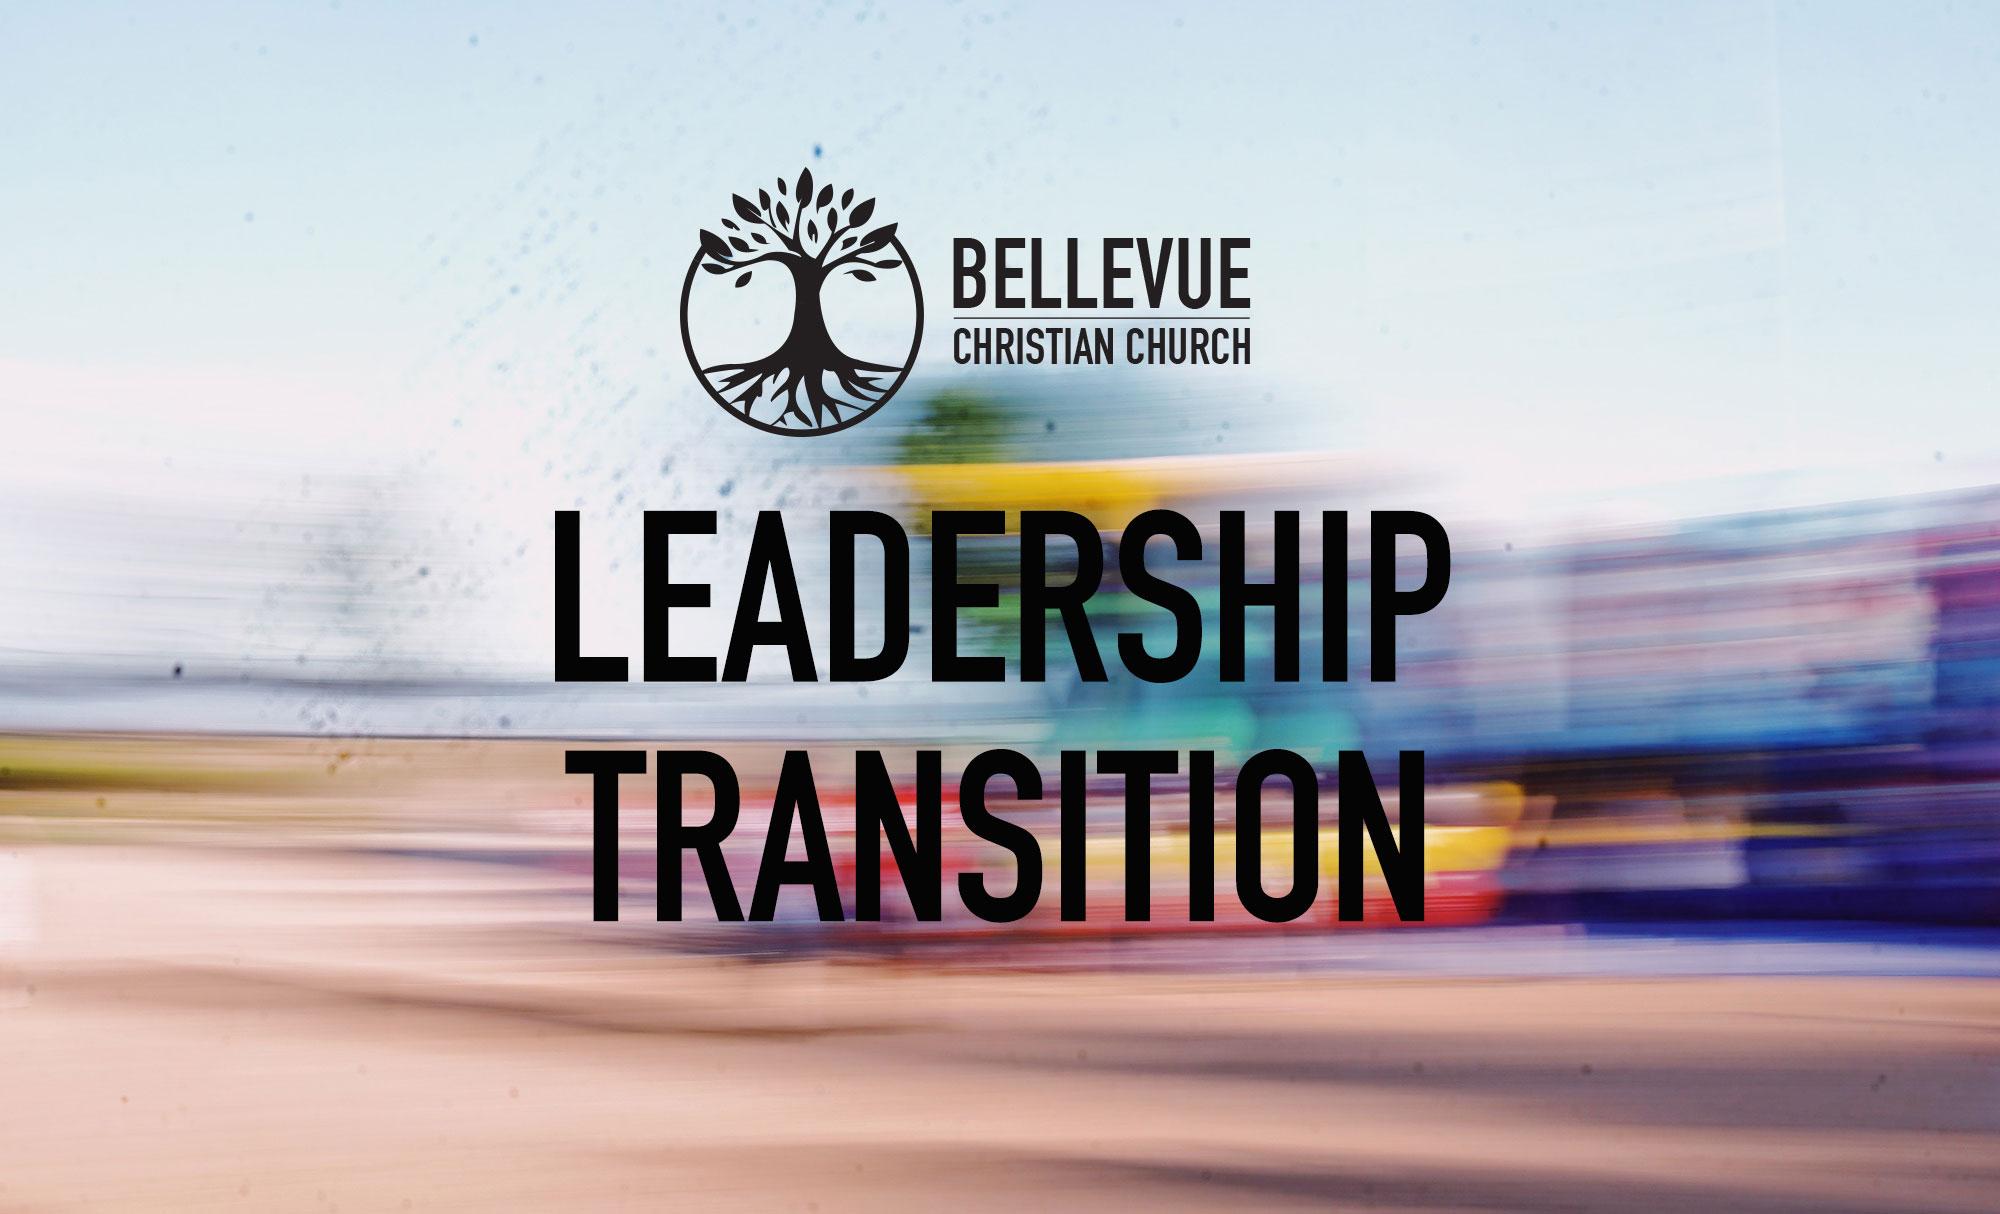 LeadershipTransition_LandingPage.jpg